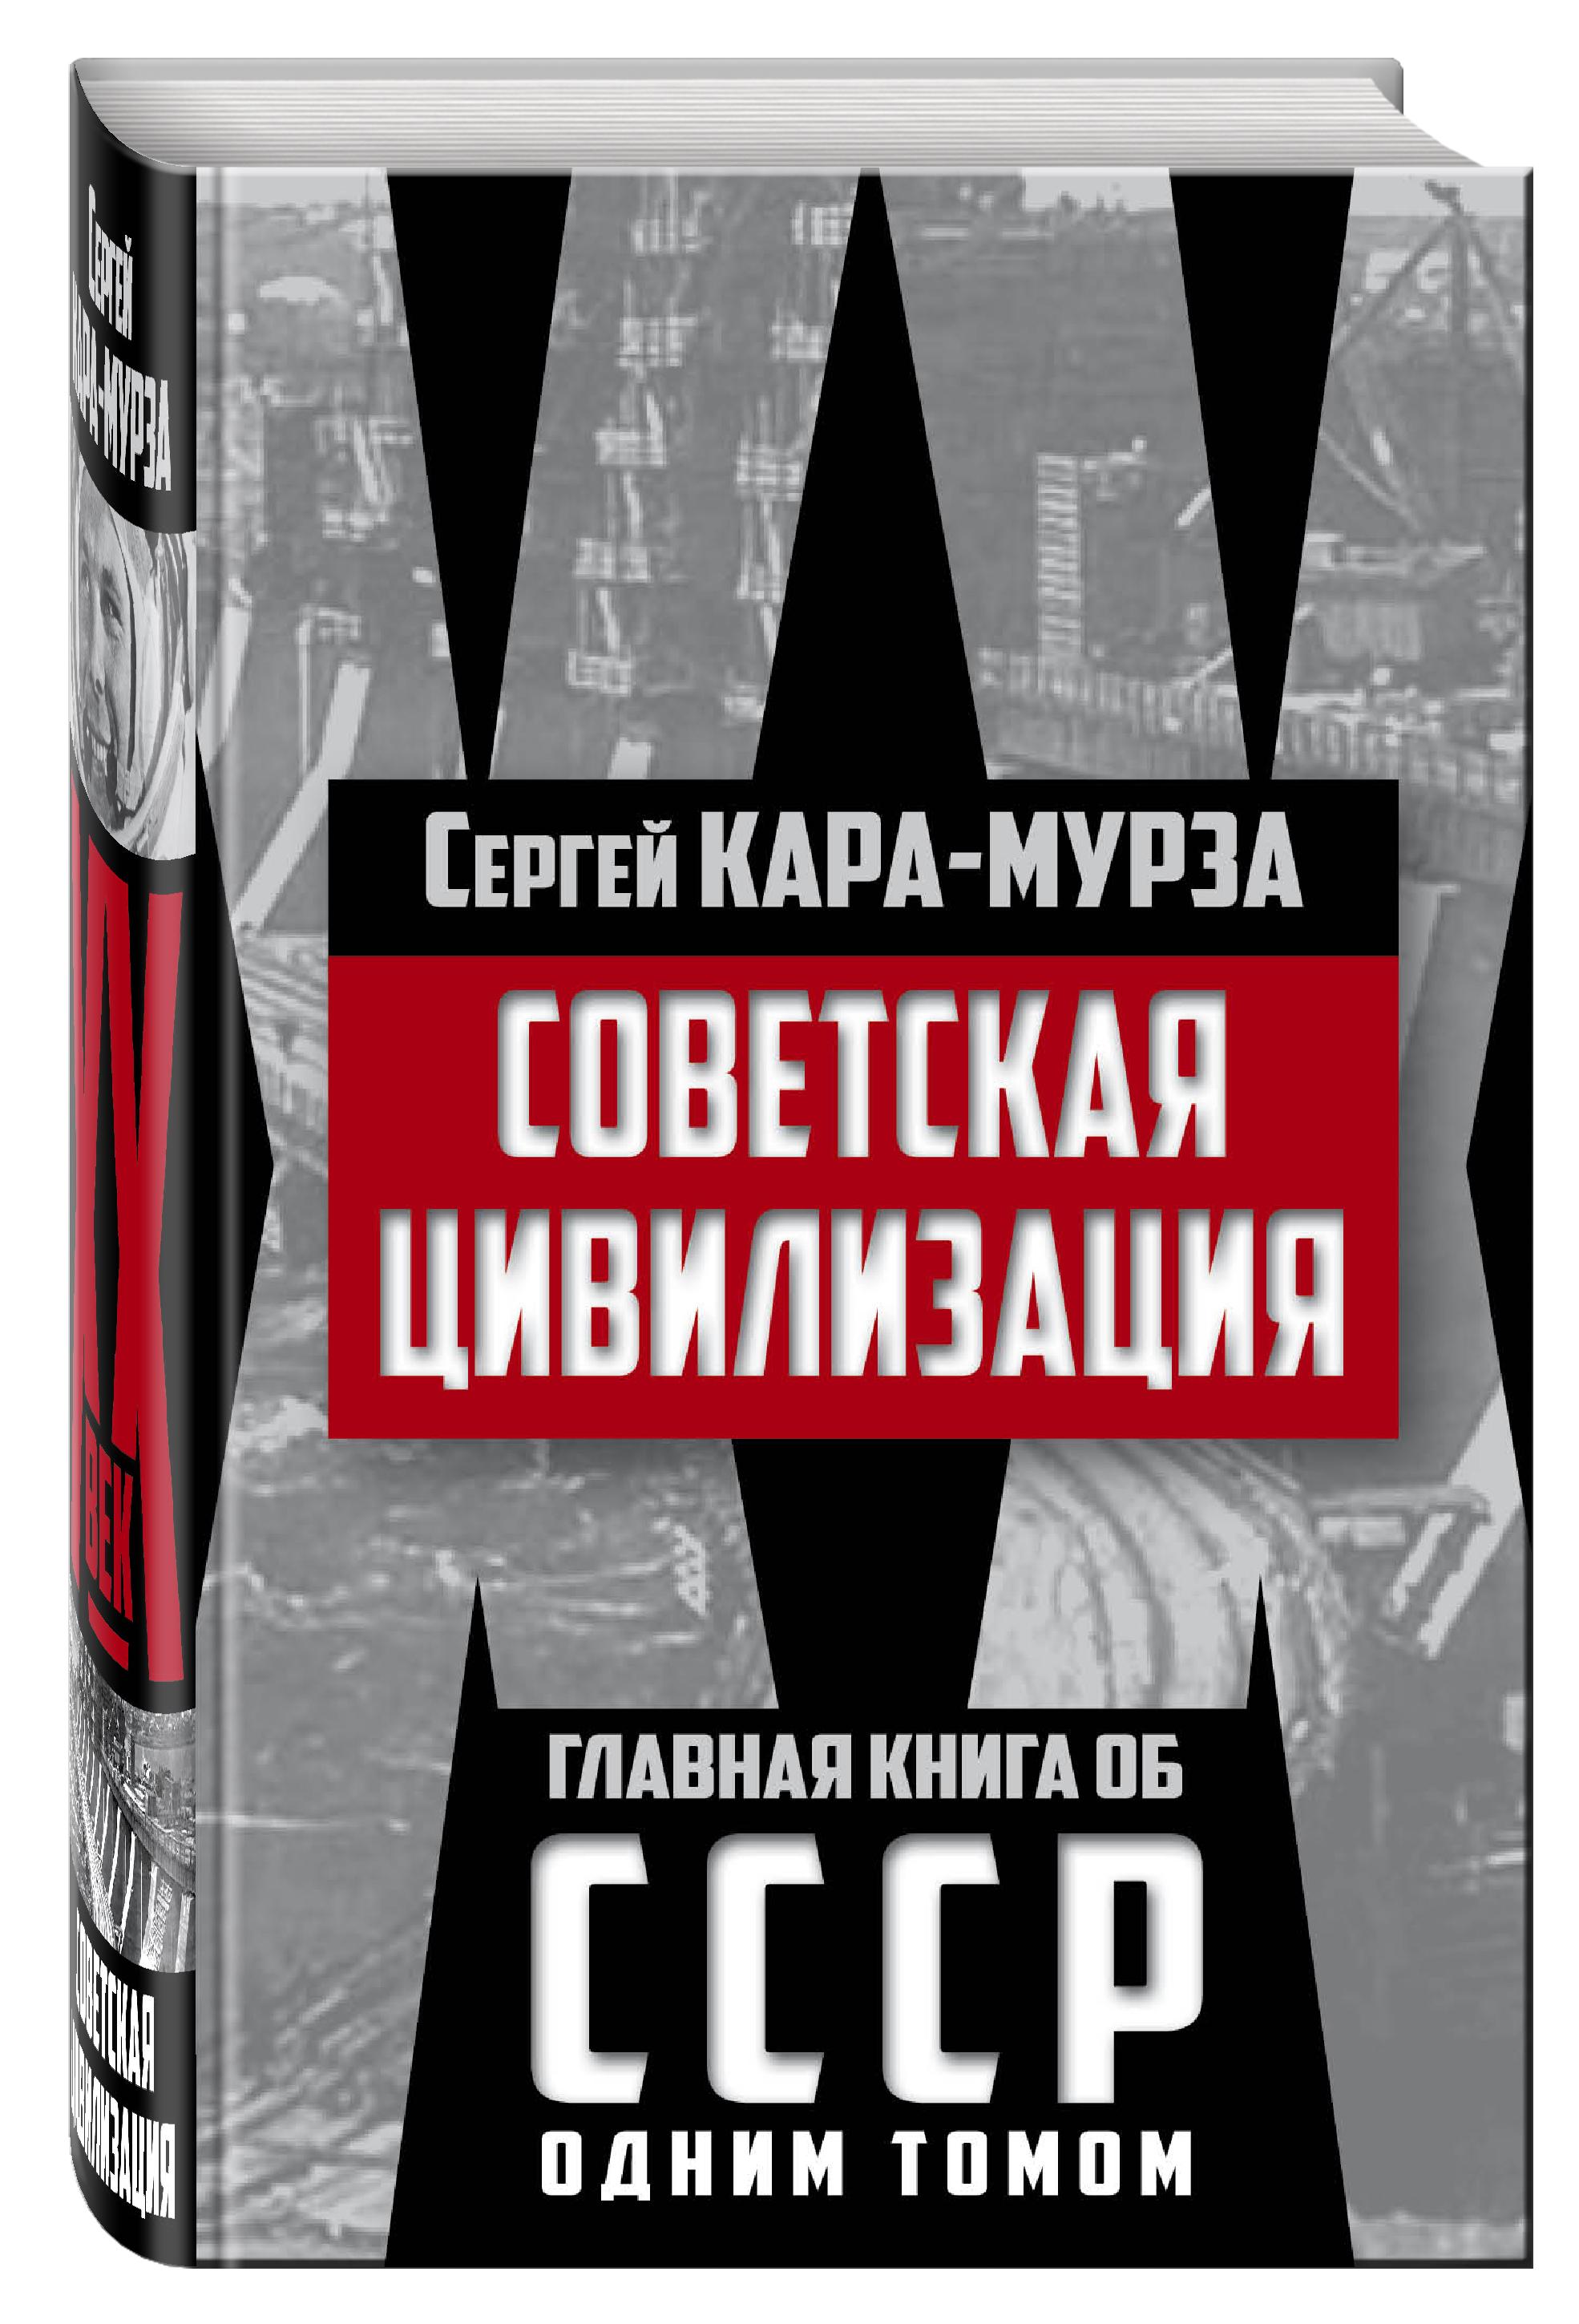 Кара-Мурза С.Г. Советская цивилизация кара мурза с г и др оранжевая мина